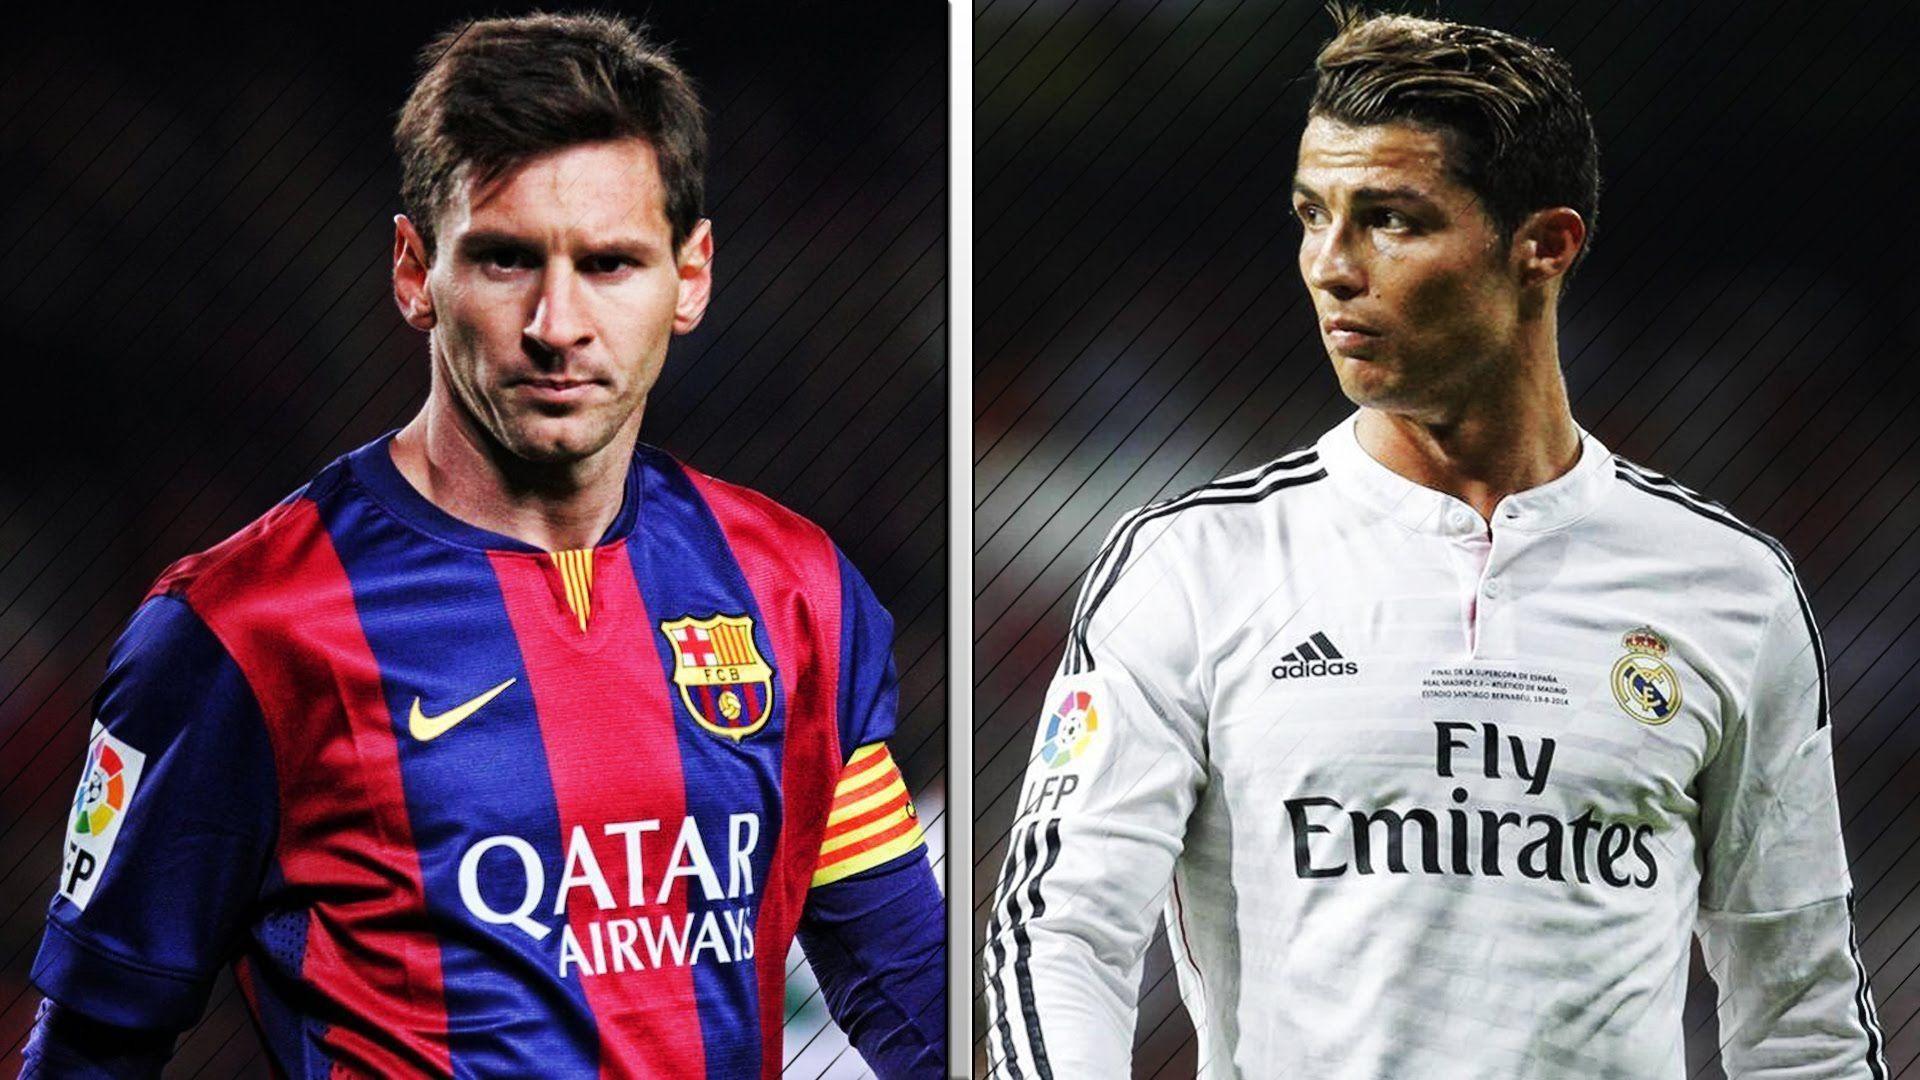 Messi Vs Ronaldo Wallpapers 2016 HD – Wallpaper Cave